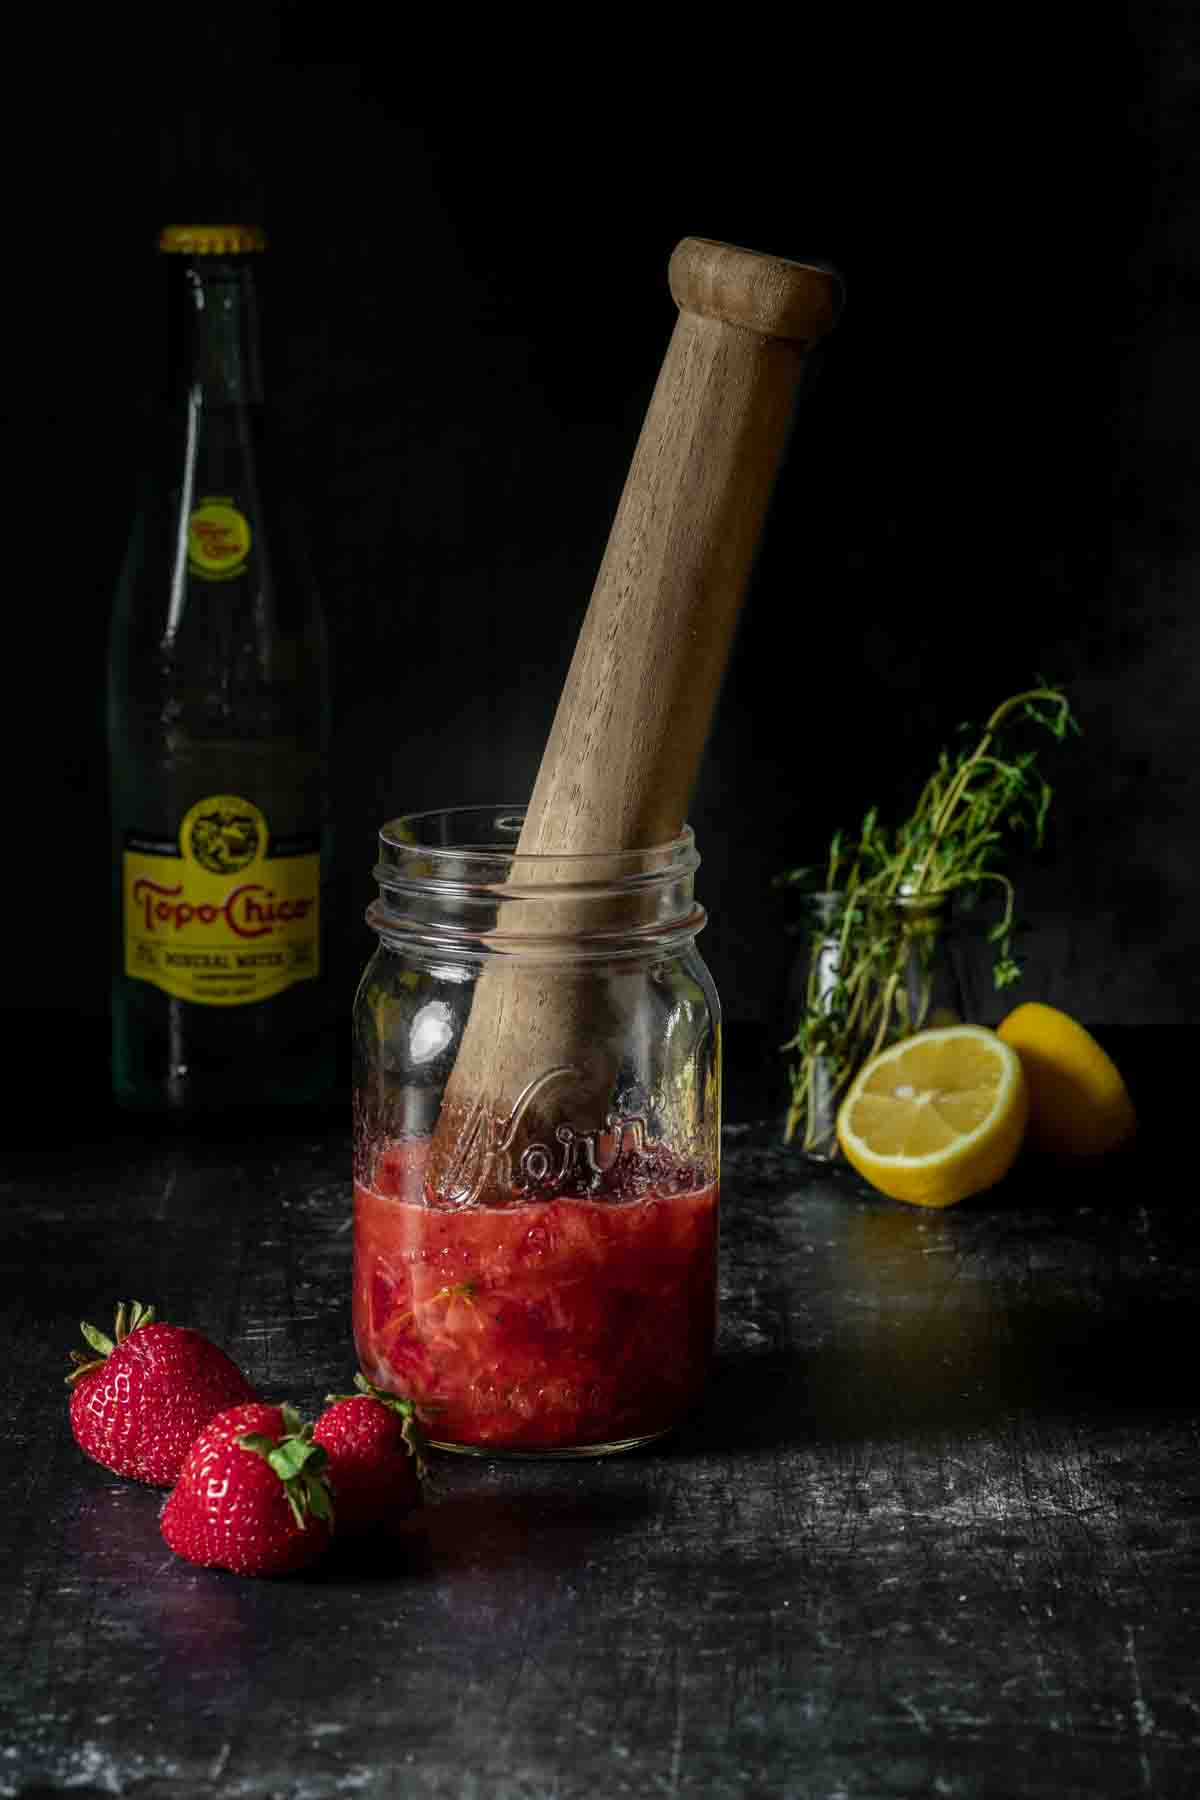 Muddle strawberries, thyme, lemon juice, vodka and sugar